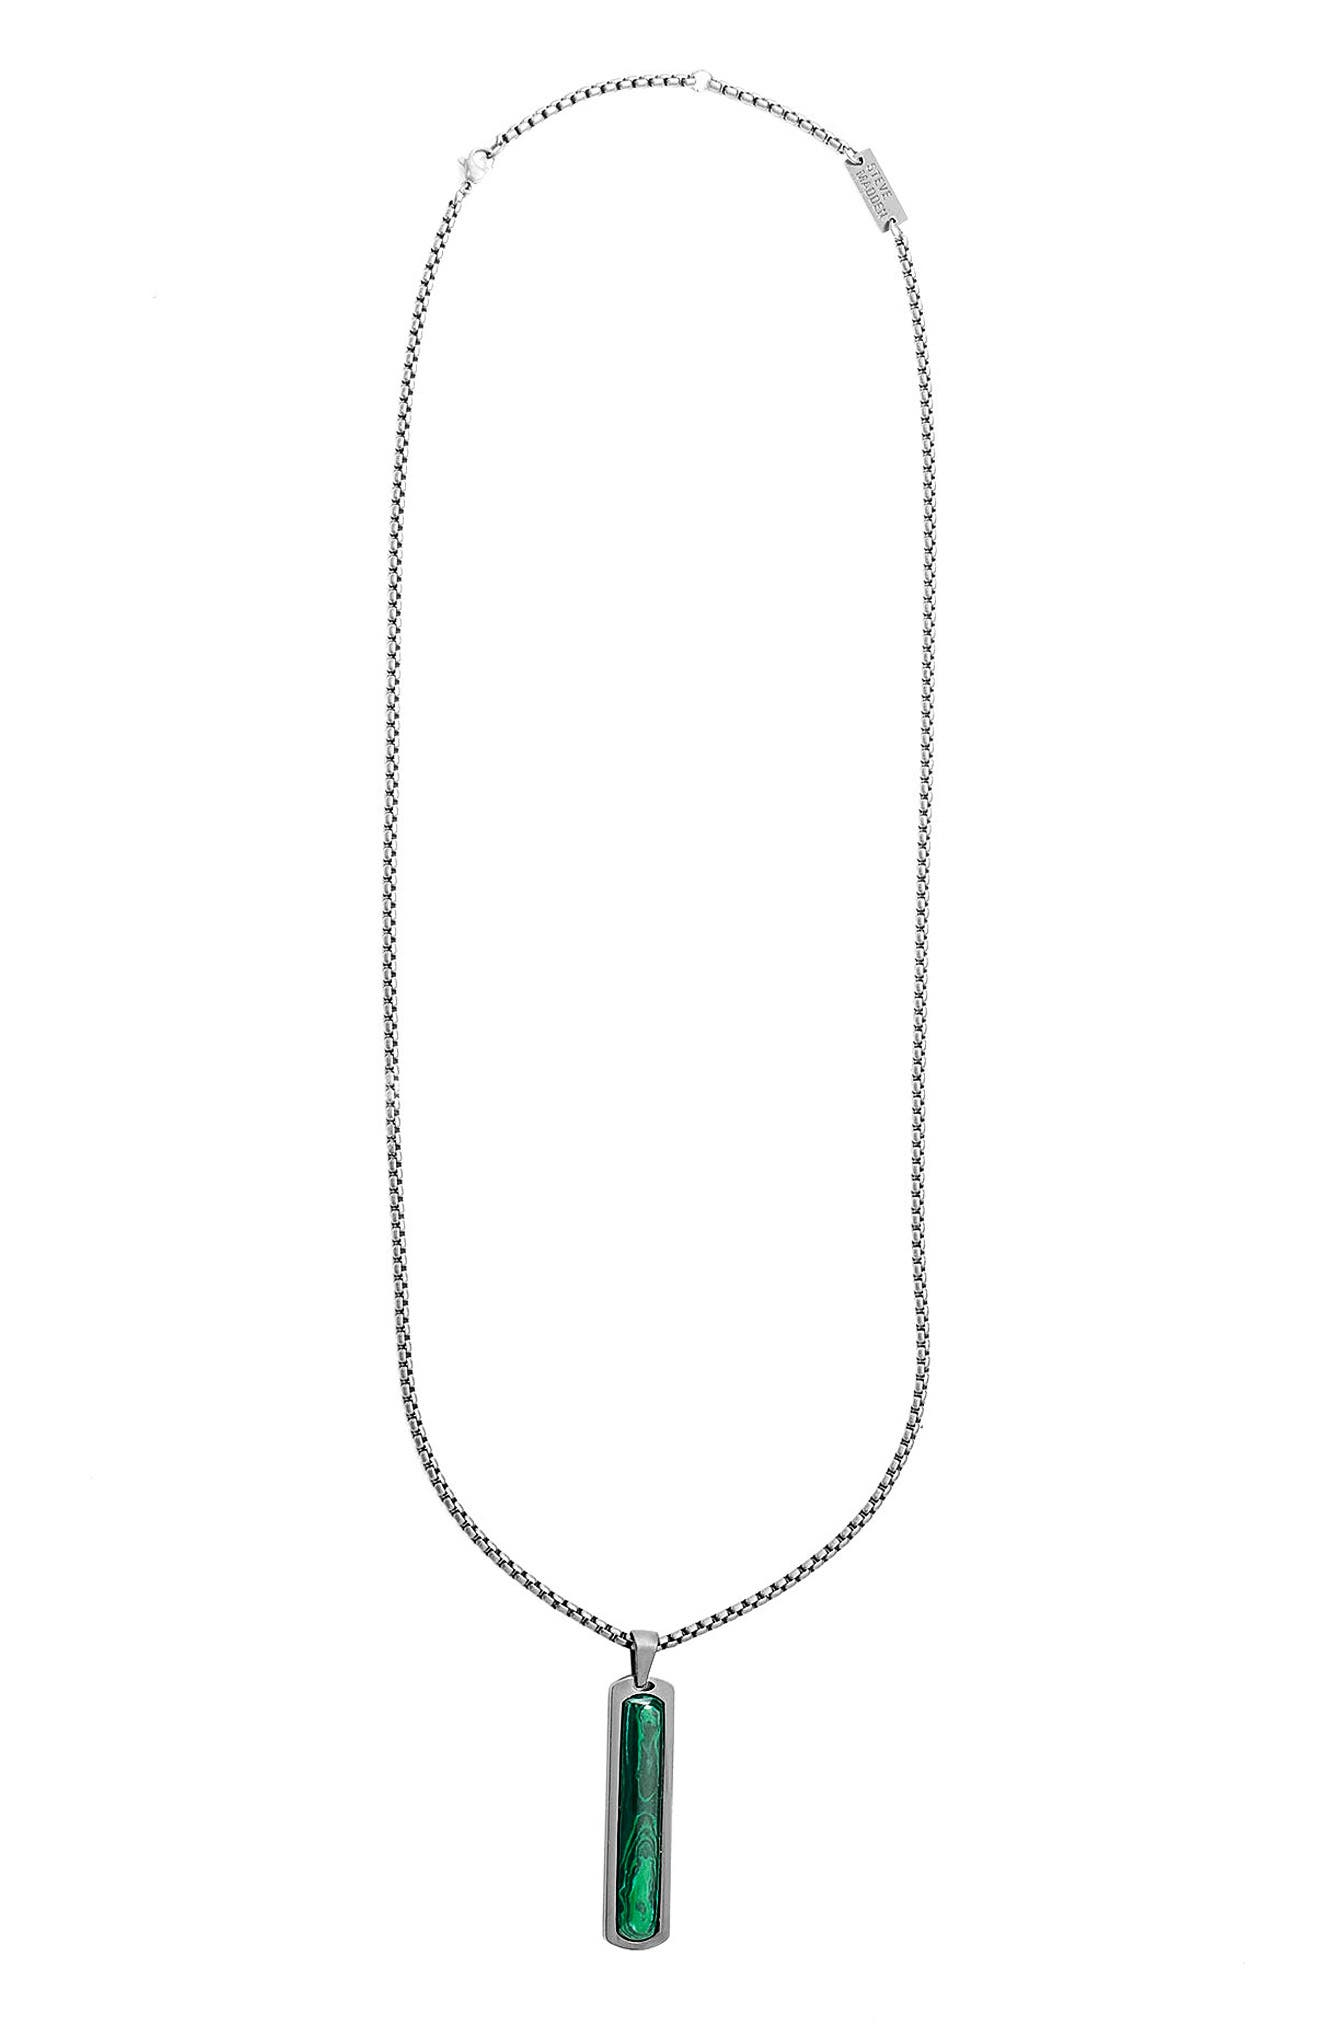 Alternate Image 1 Selected - Steve Madden Oxidized Malachite Pendant Necklace